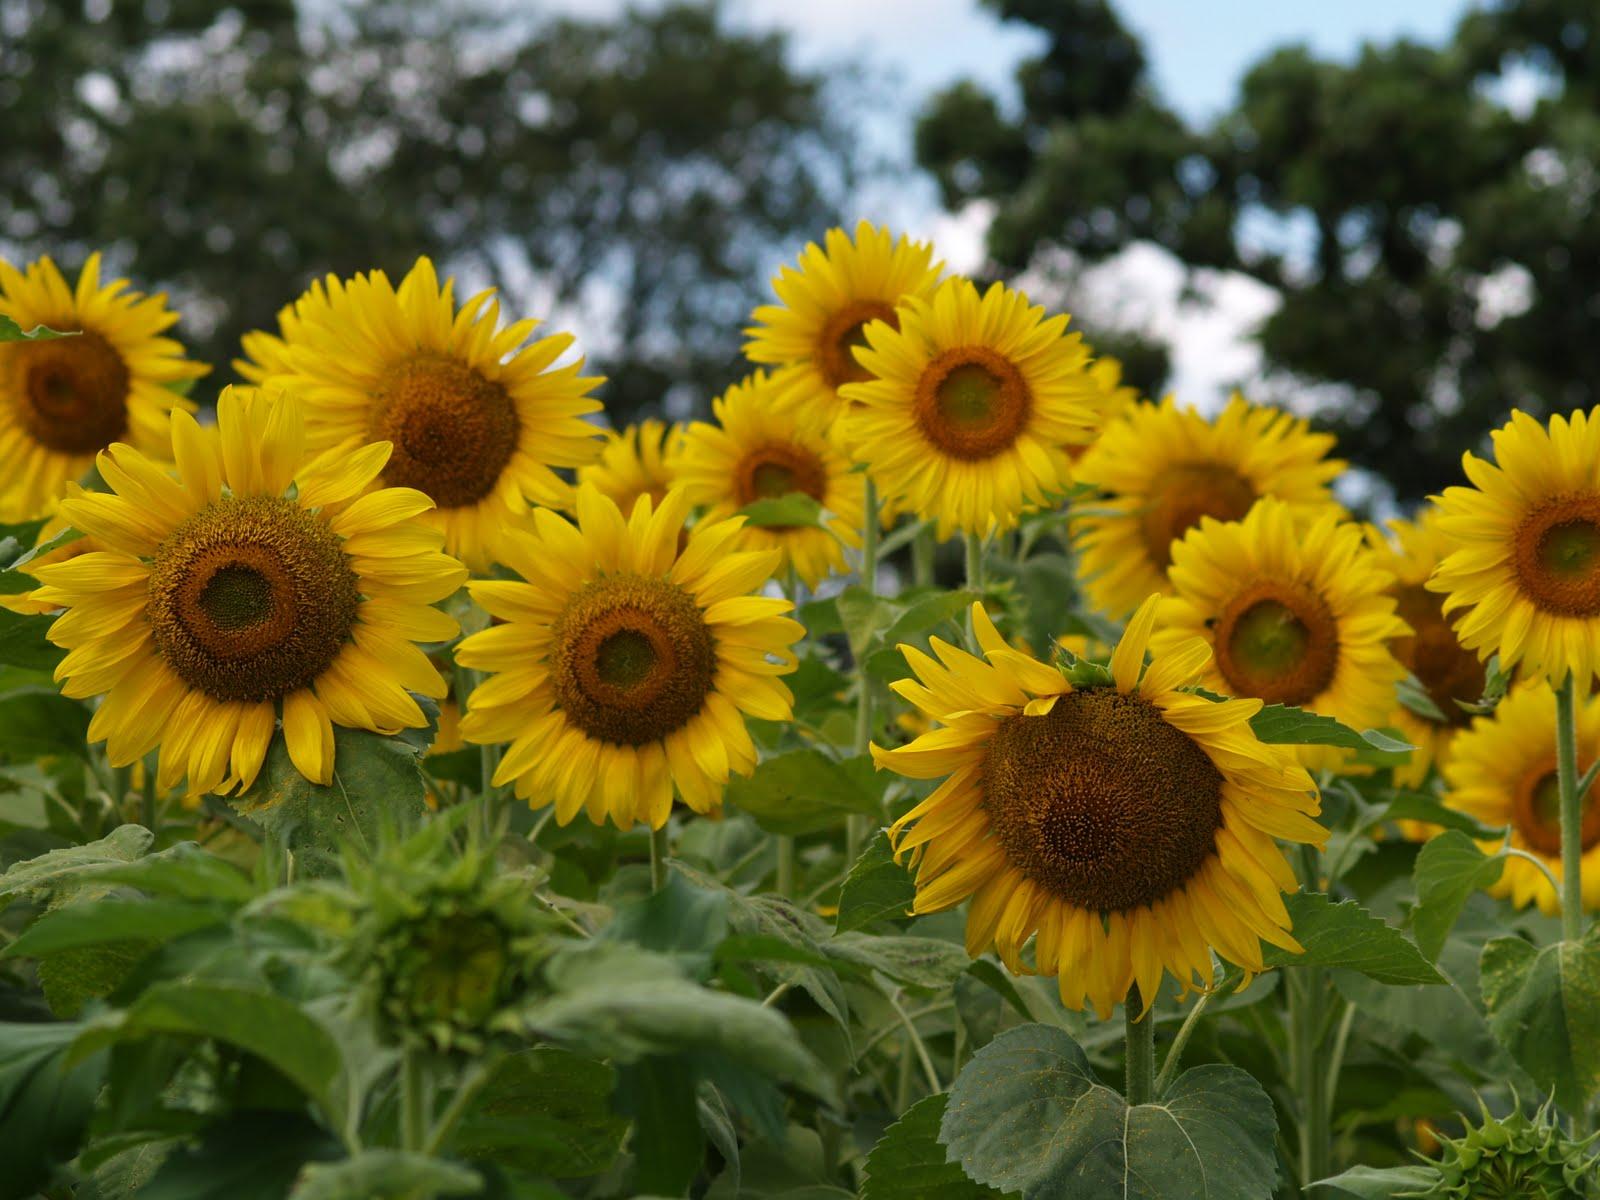 The sunflower essay example